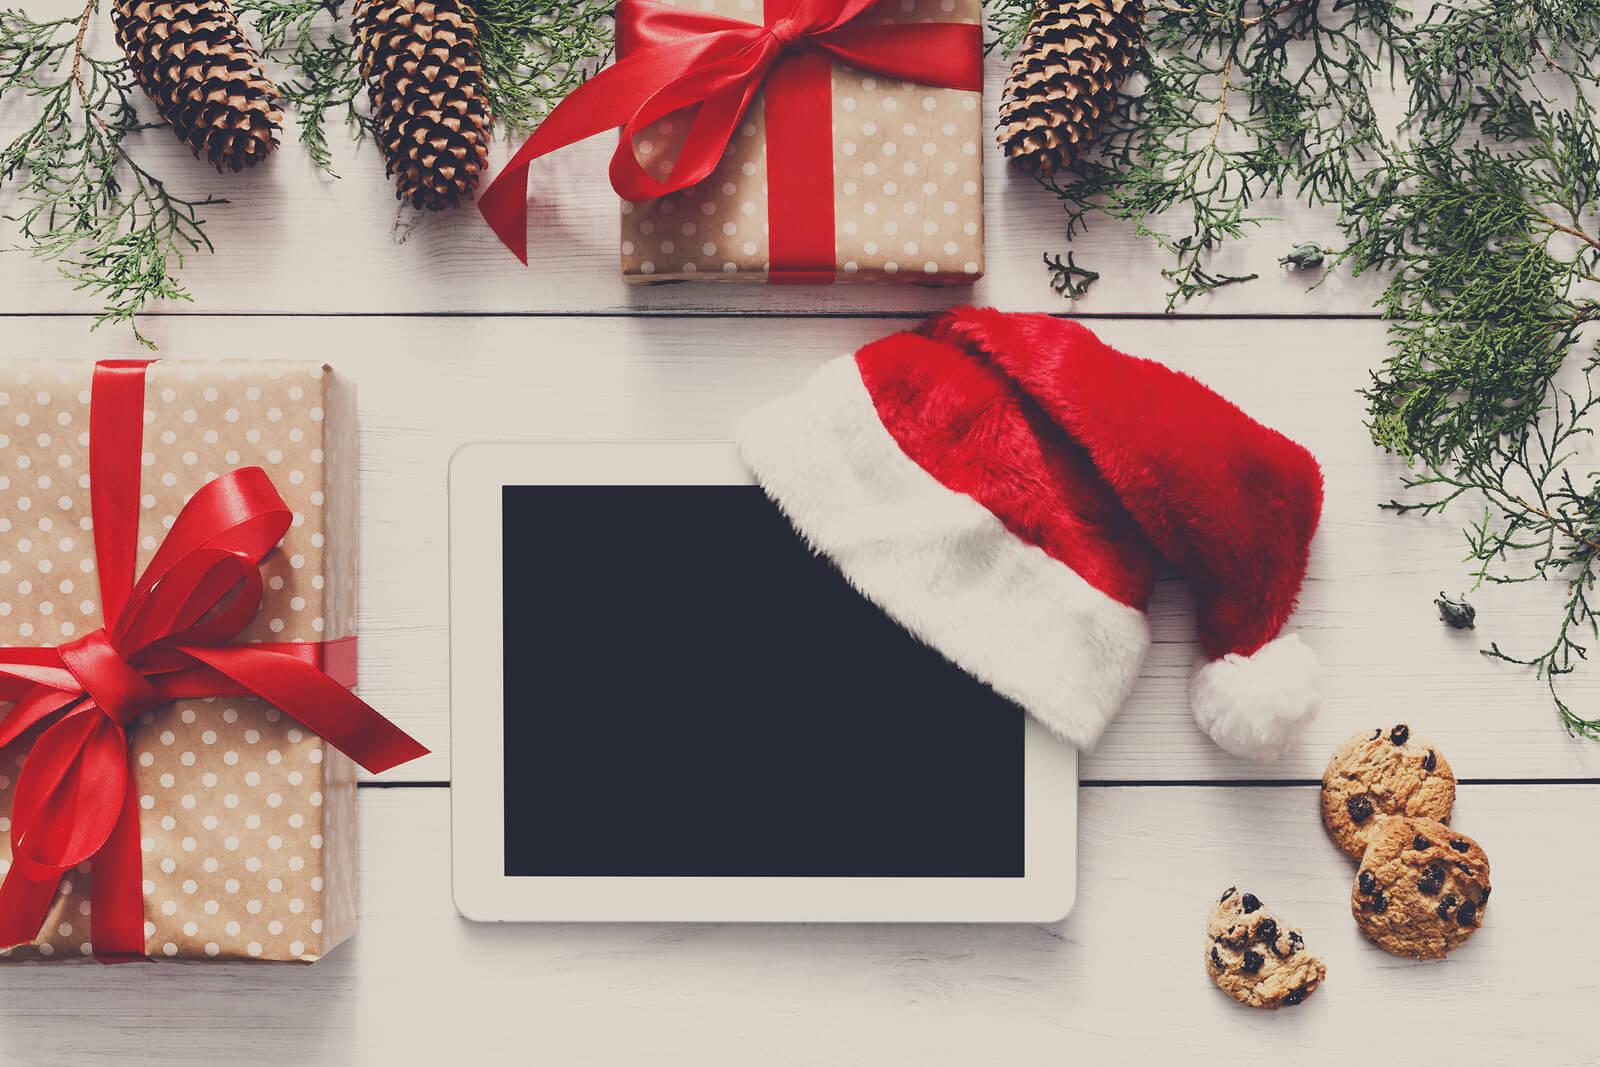 Attract More Customers This Holiday Season